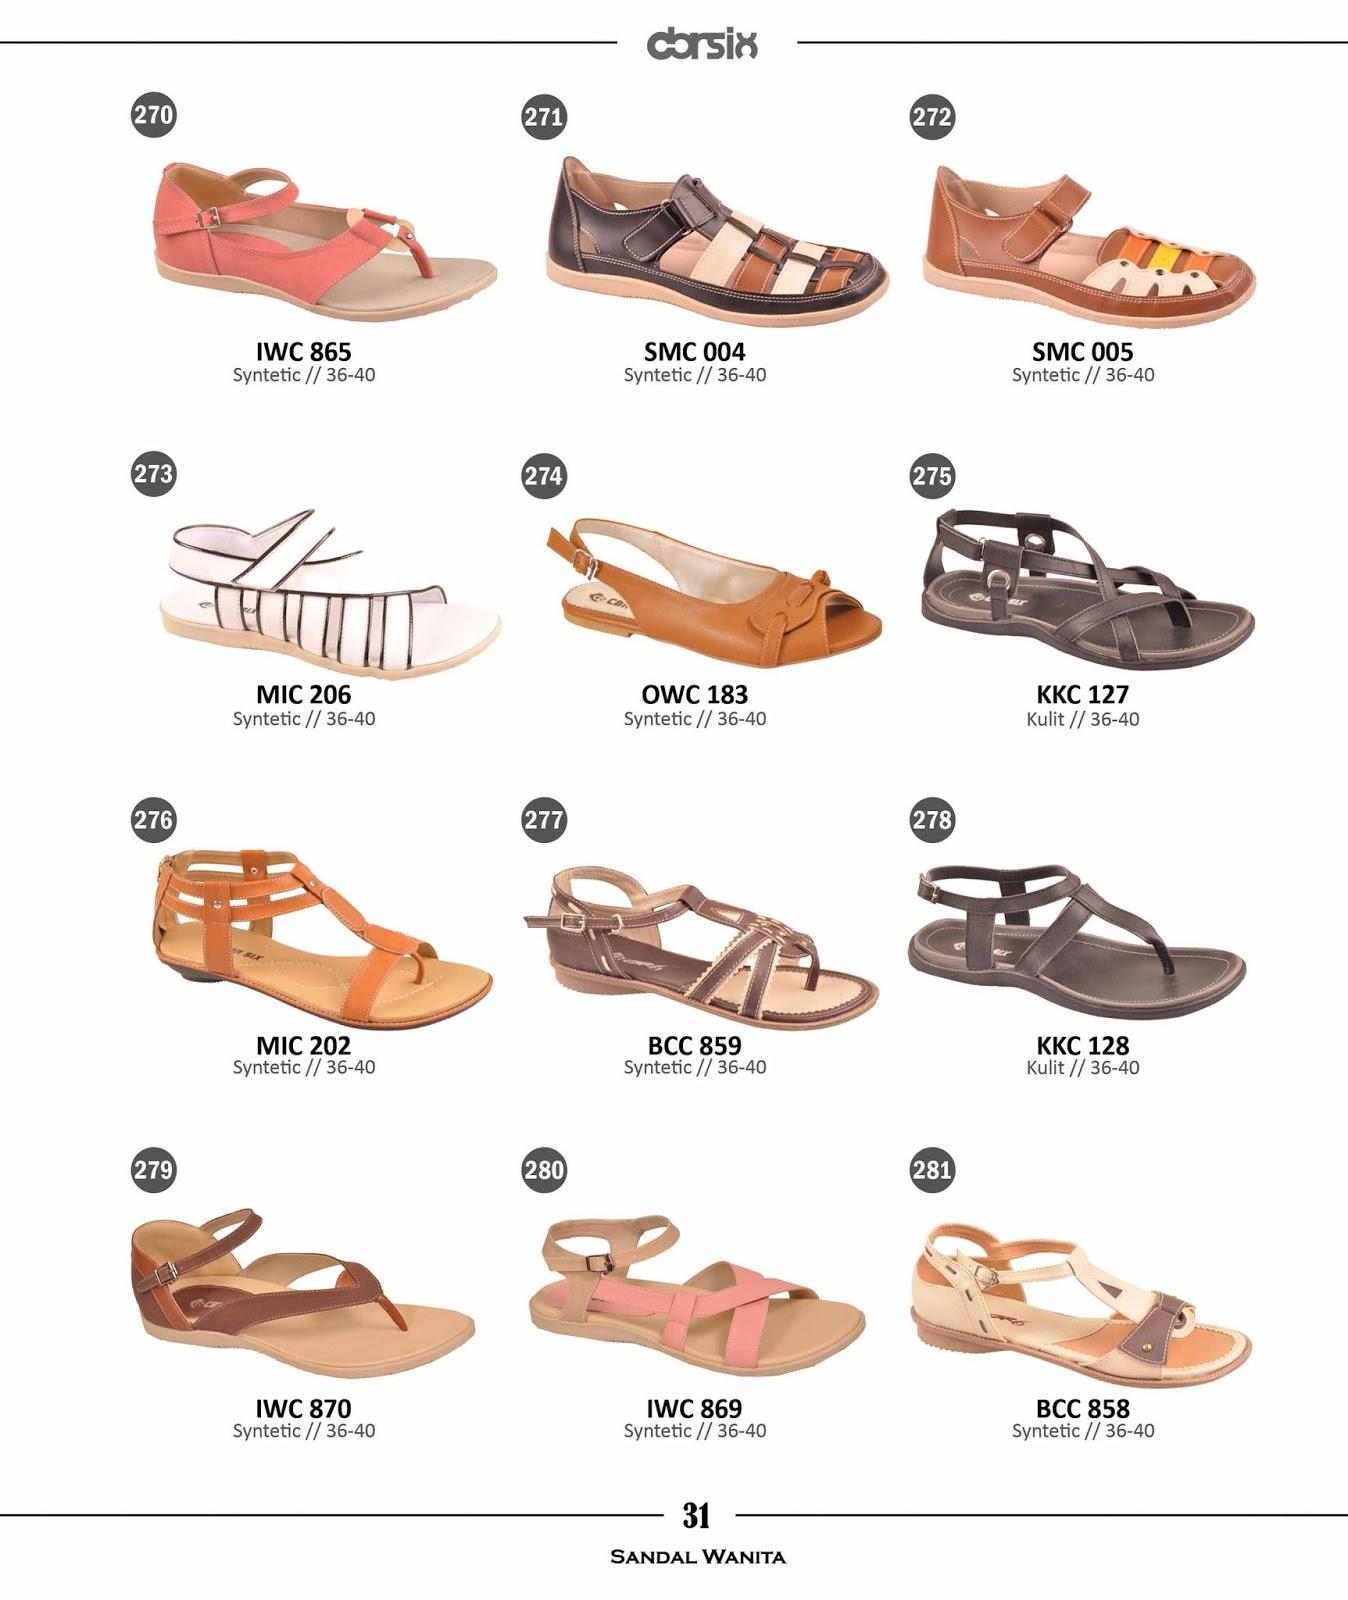 Katalog Terbaru Cbr Six 2015 2016 Distro Model Terkini Gamis Raindoz Bbr251 Sandal Wanita